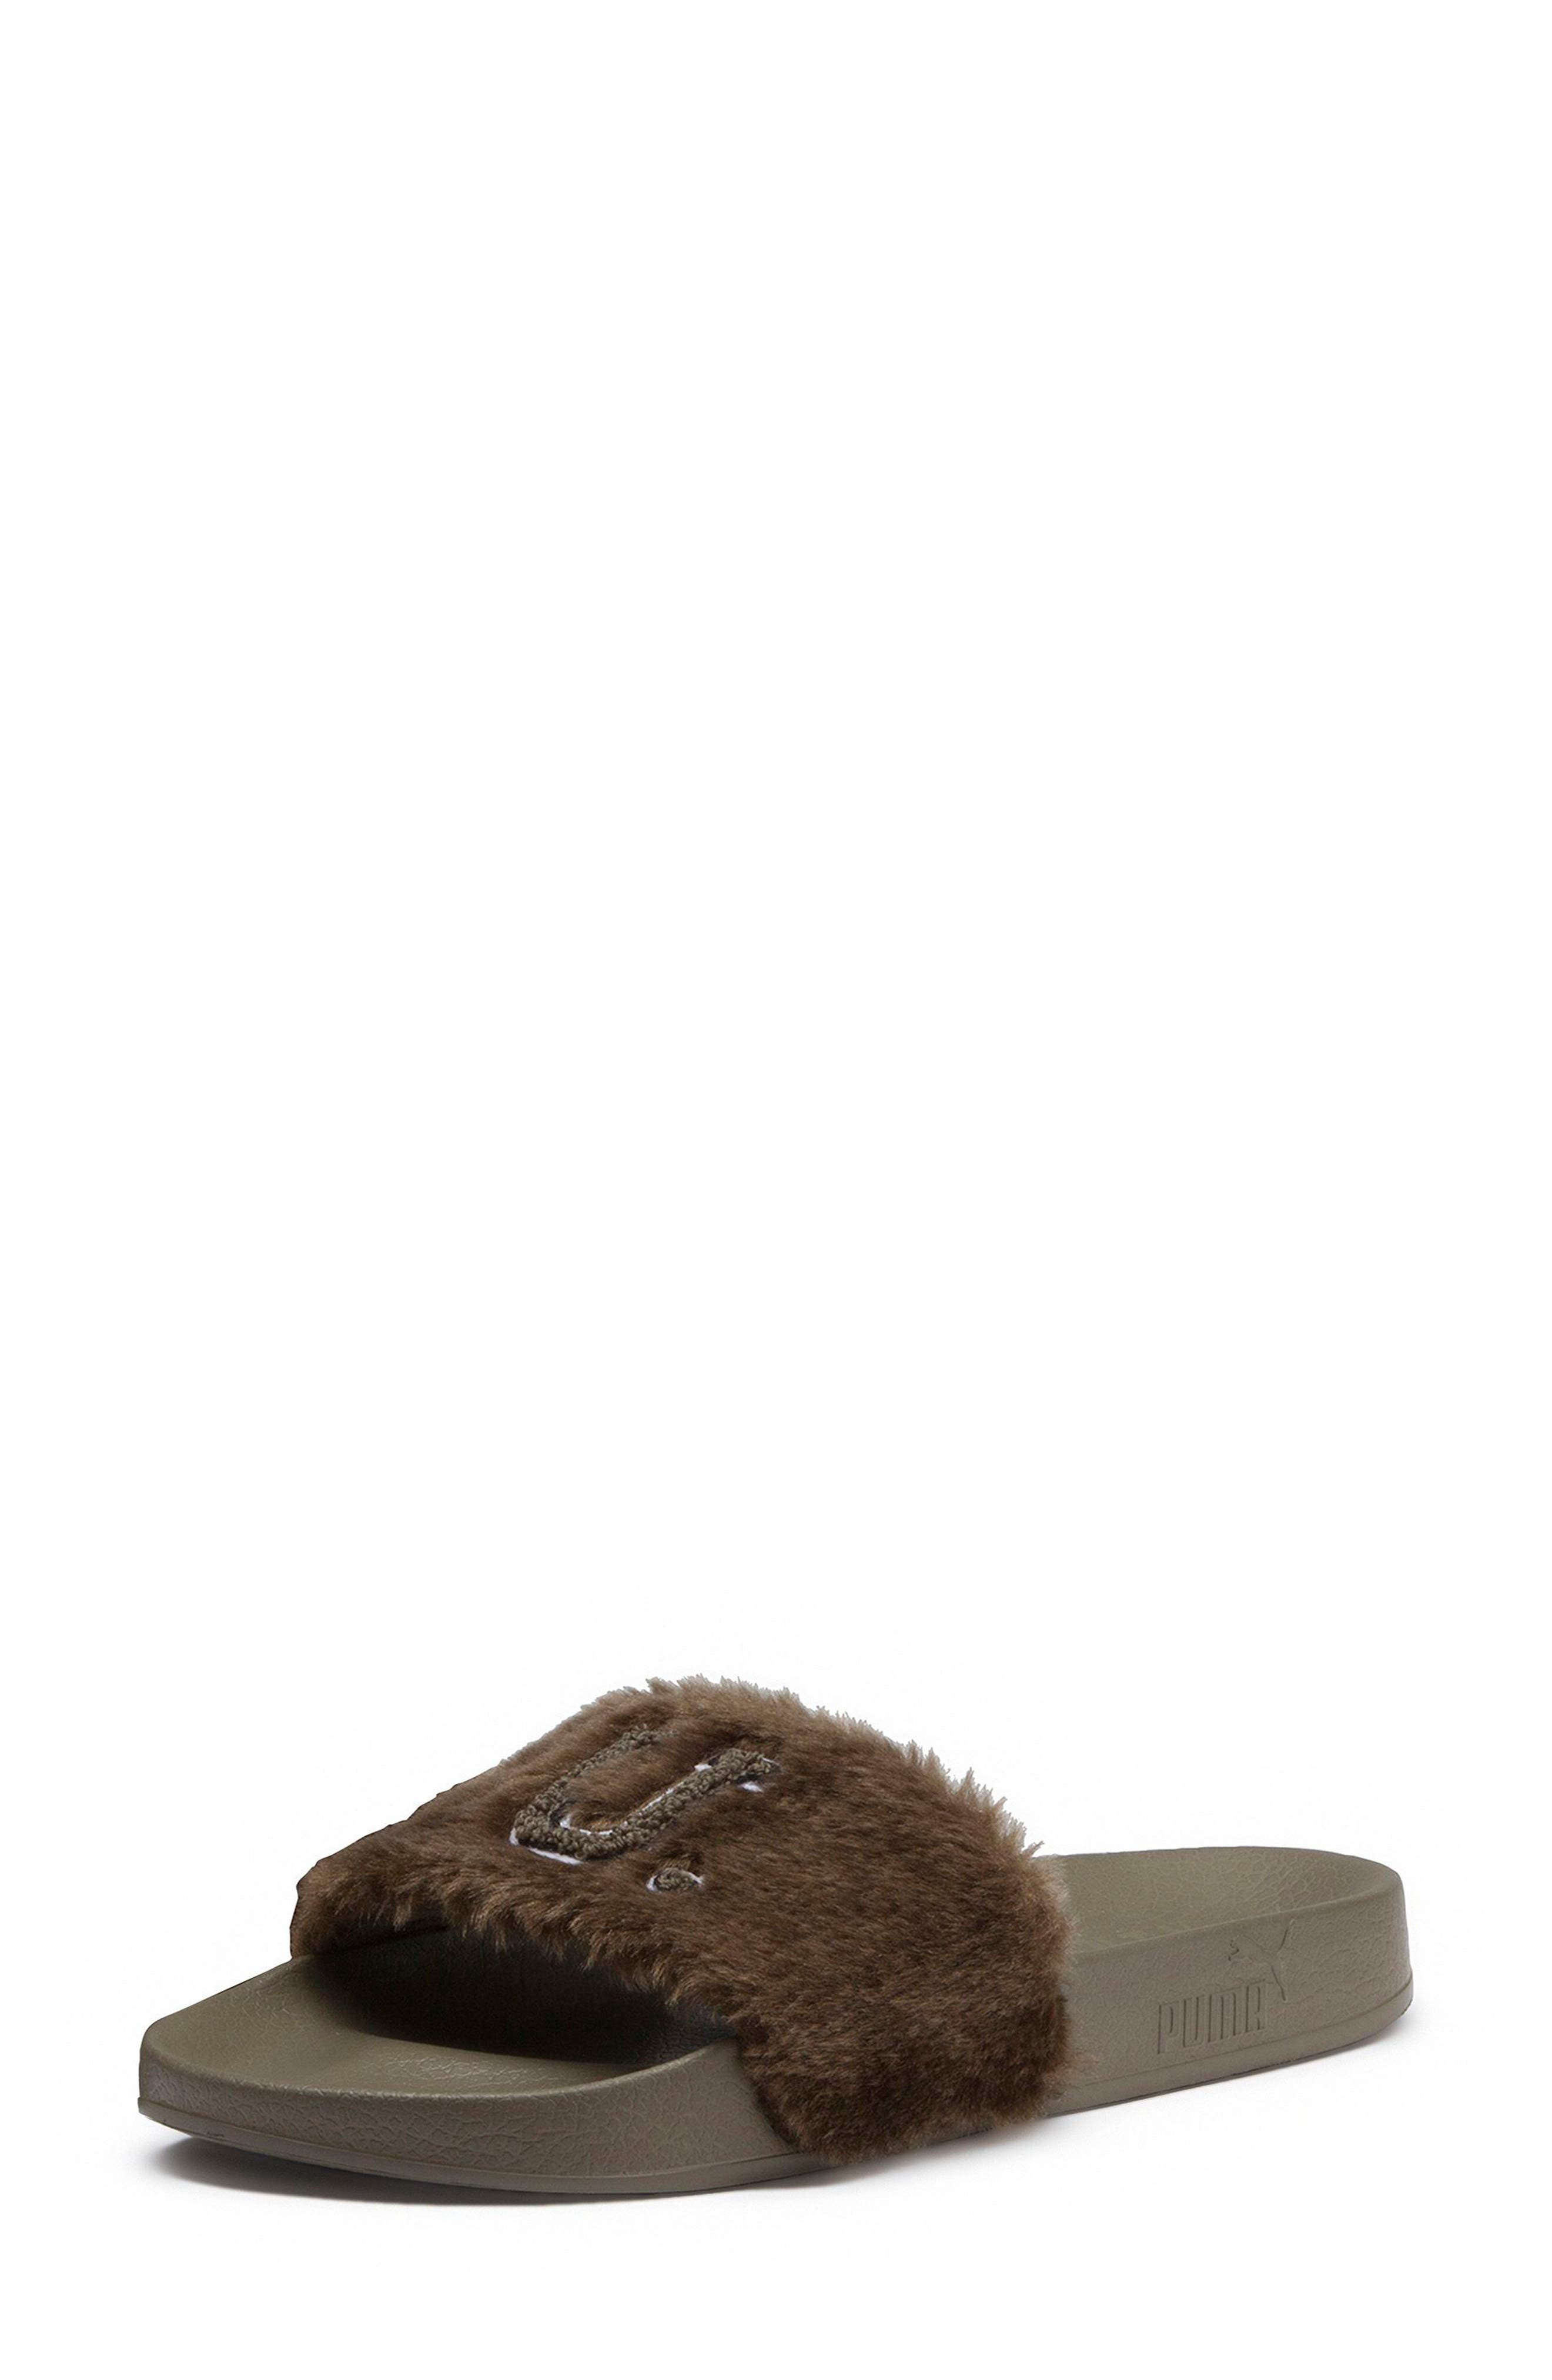 FENTY PUMA by Rihanna Lead Cat Slide Sandals,                         Main,                         color, 300